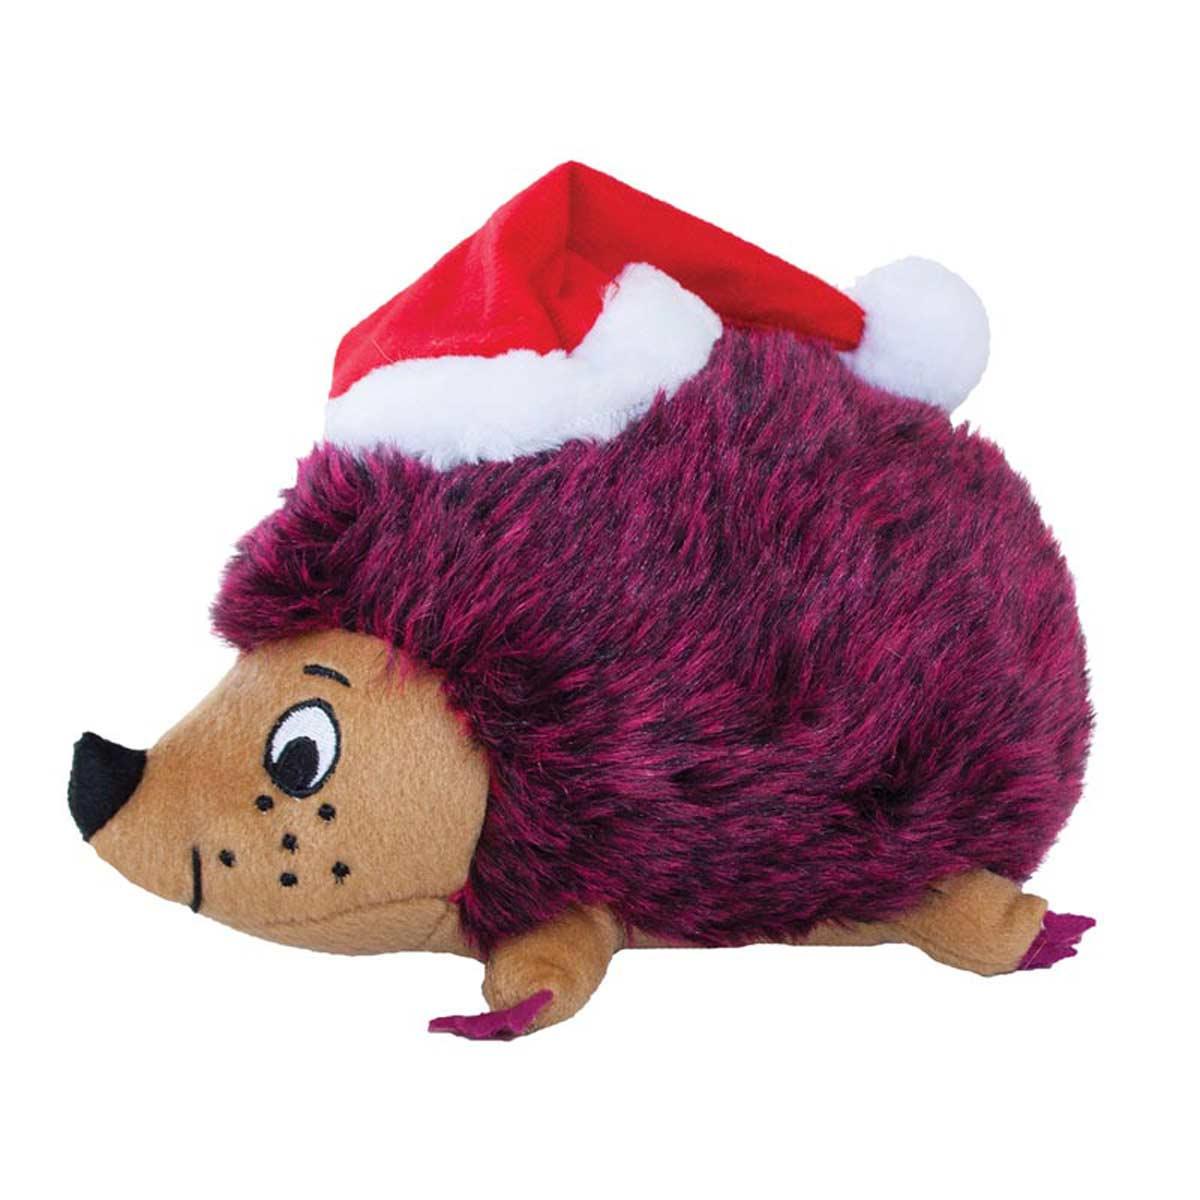 Outward Hound Medium Red Holiday Heggie Stuffed Dog Toy - Squeaks, Grunts, Rattles